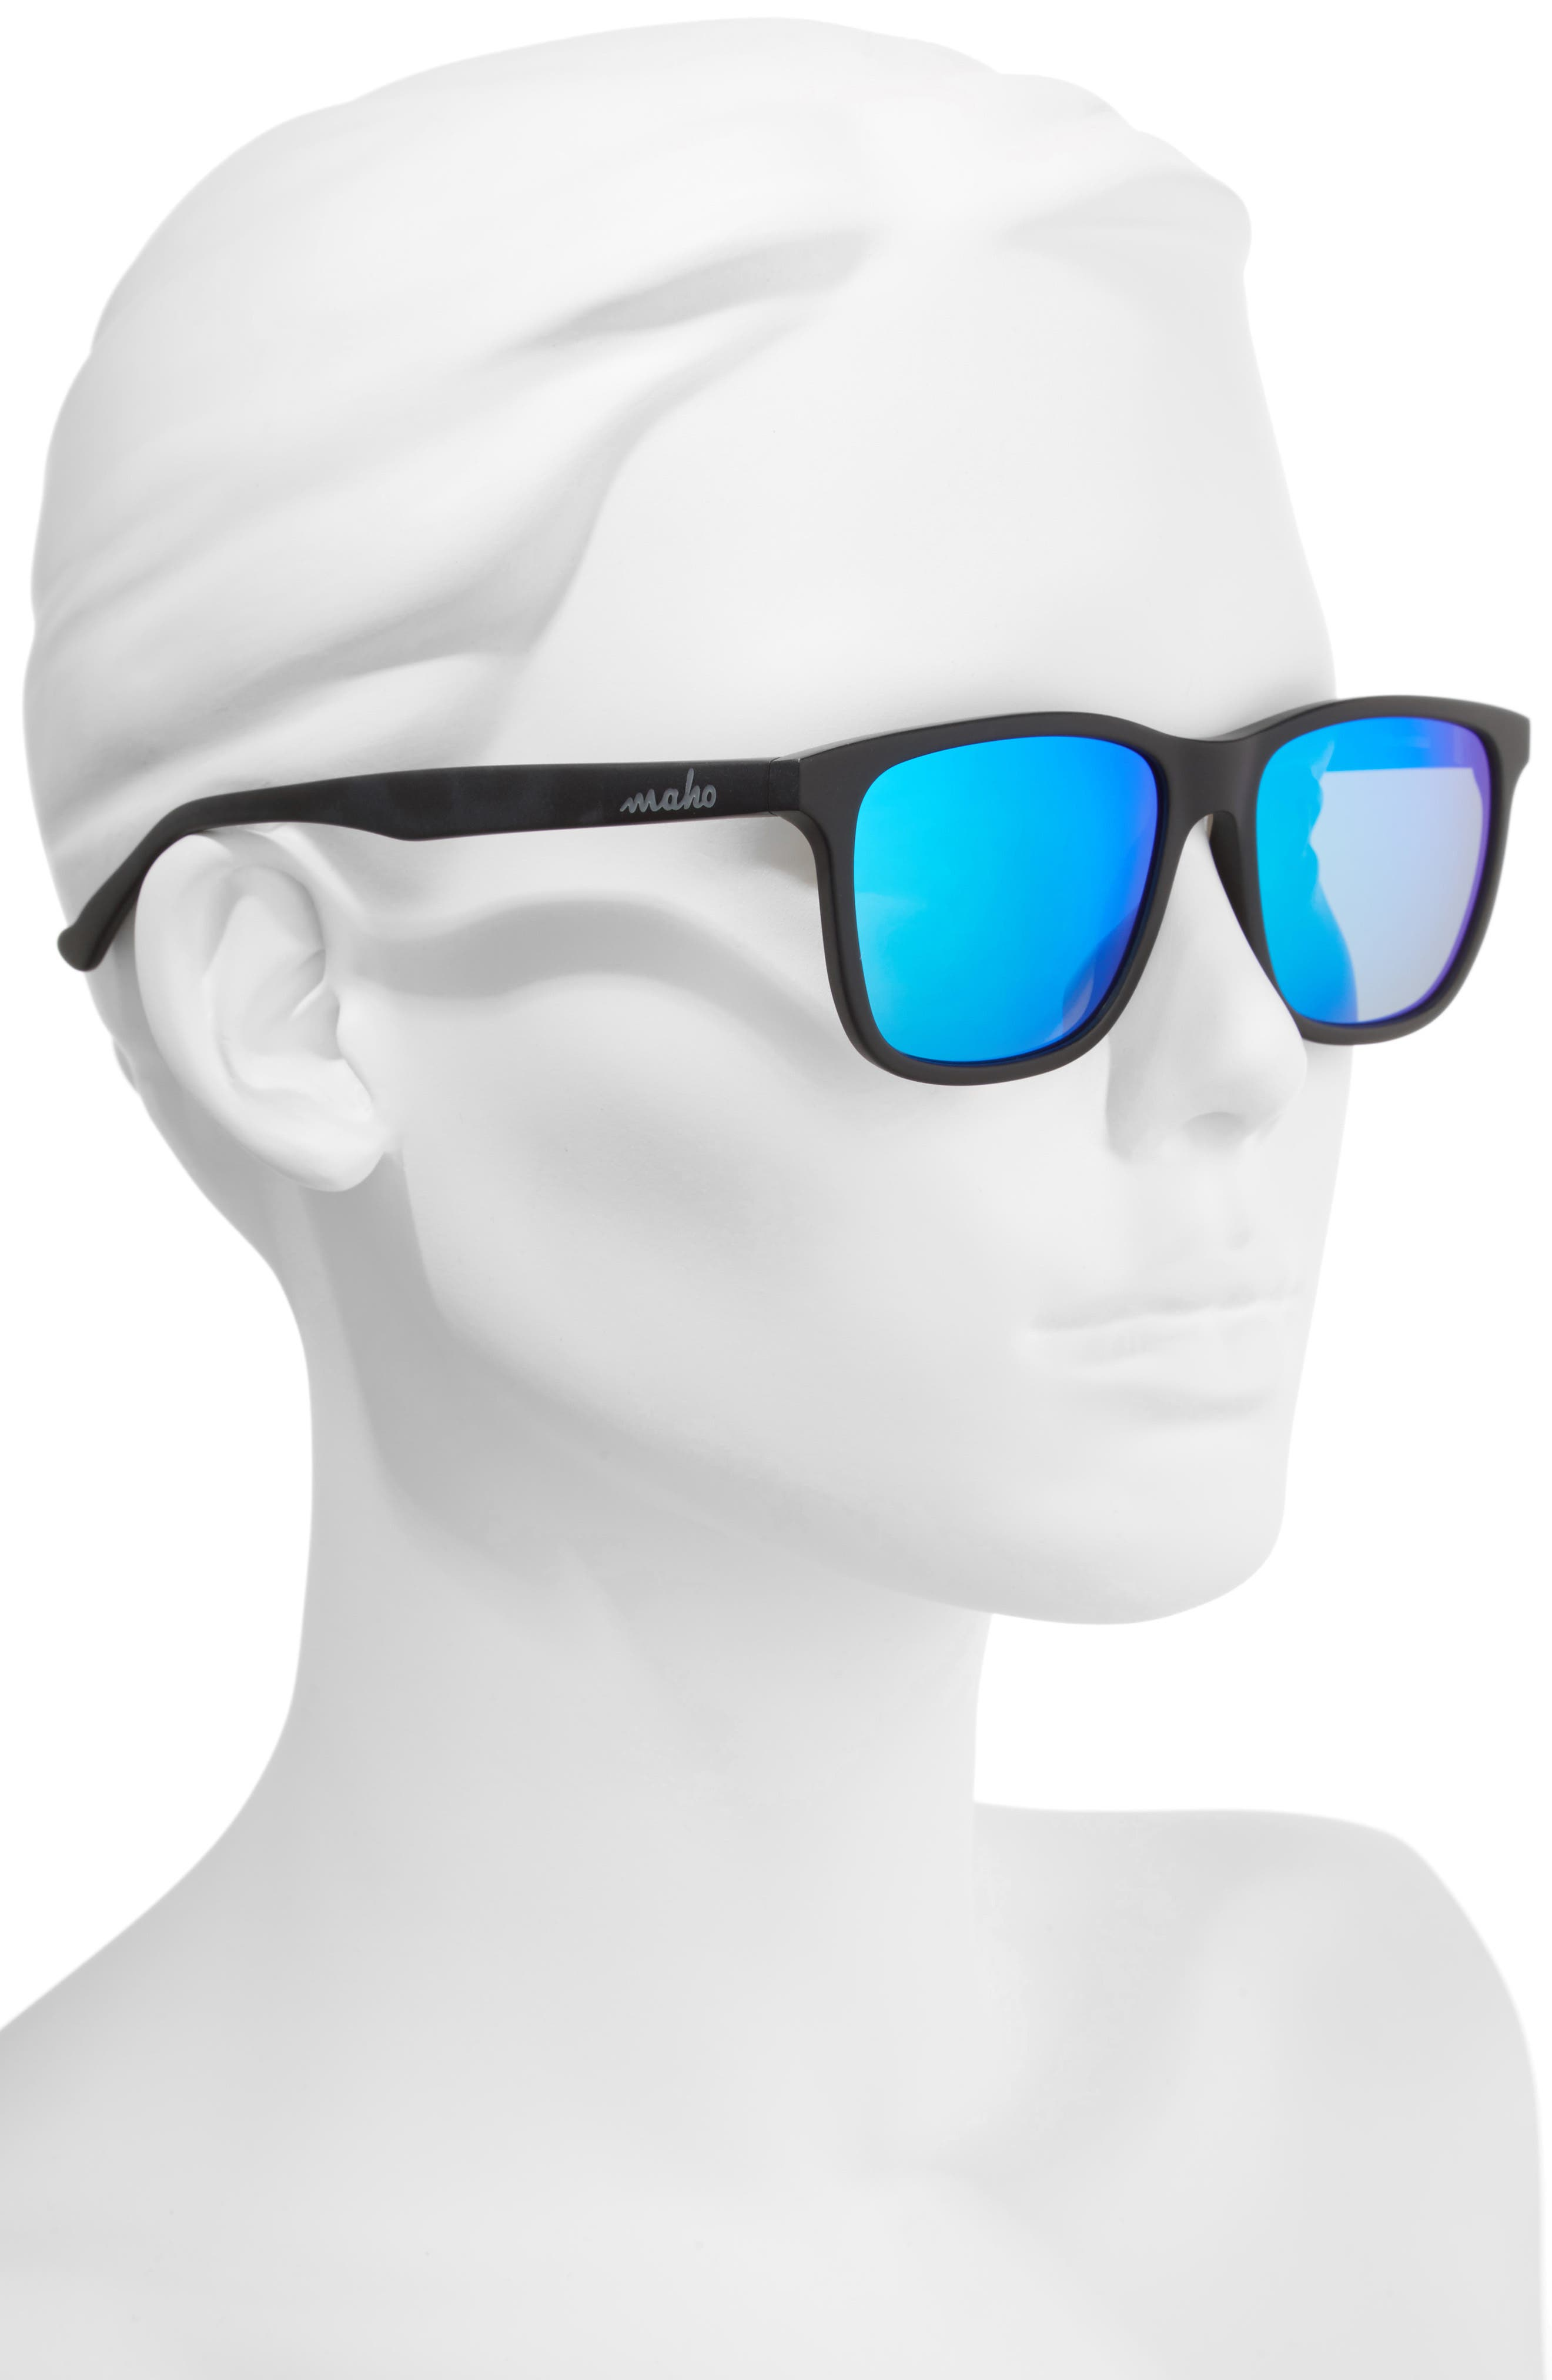 Uluwatu 52mm Polarized Sunglasses,                             Alternate thumbnail 2, color,                             Charcoal